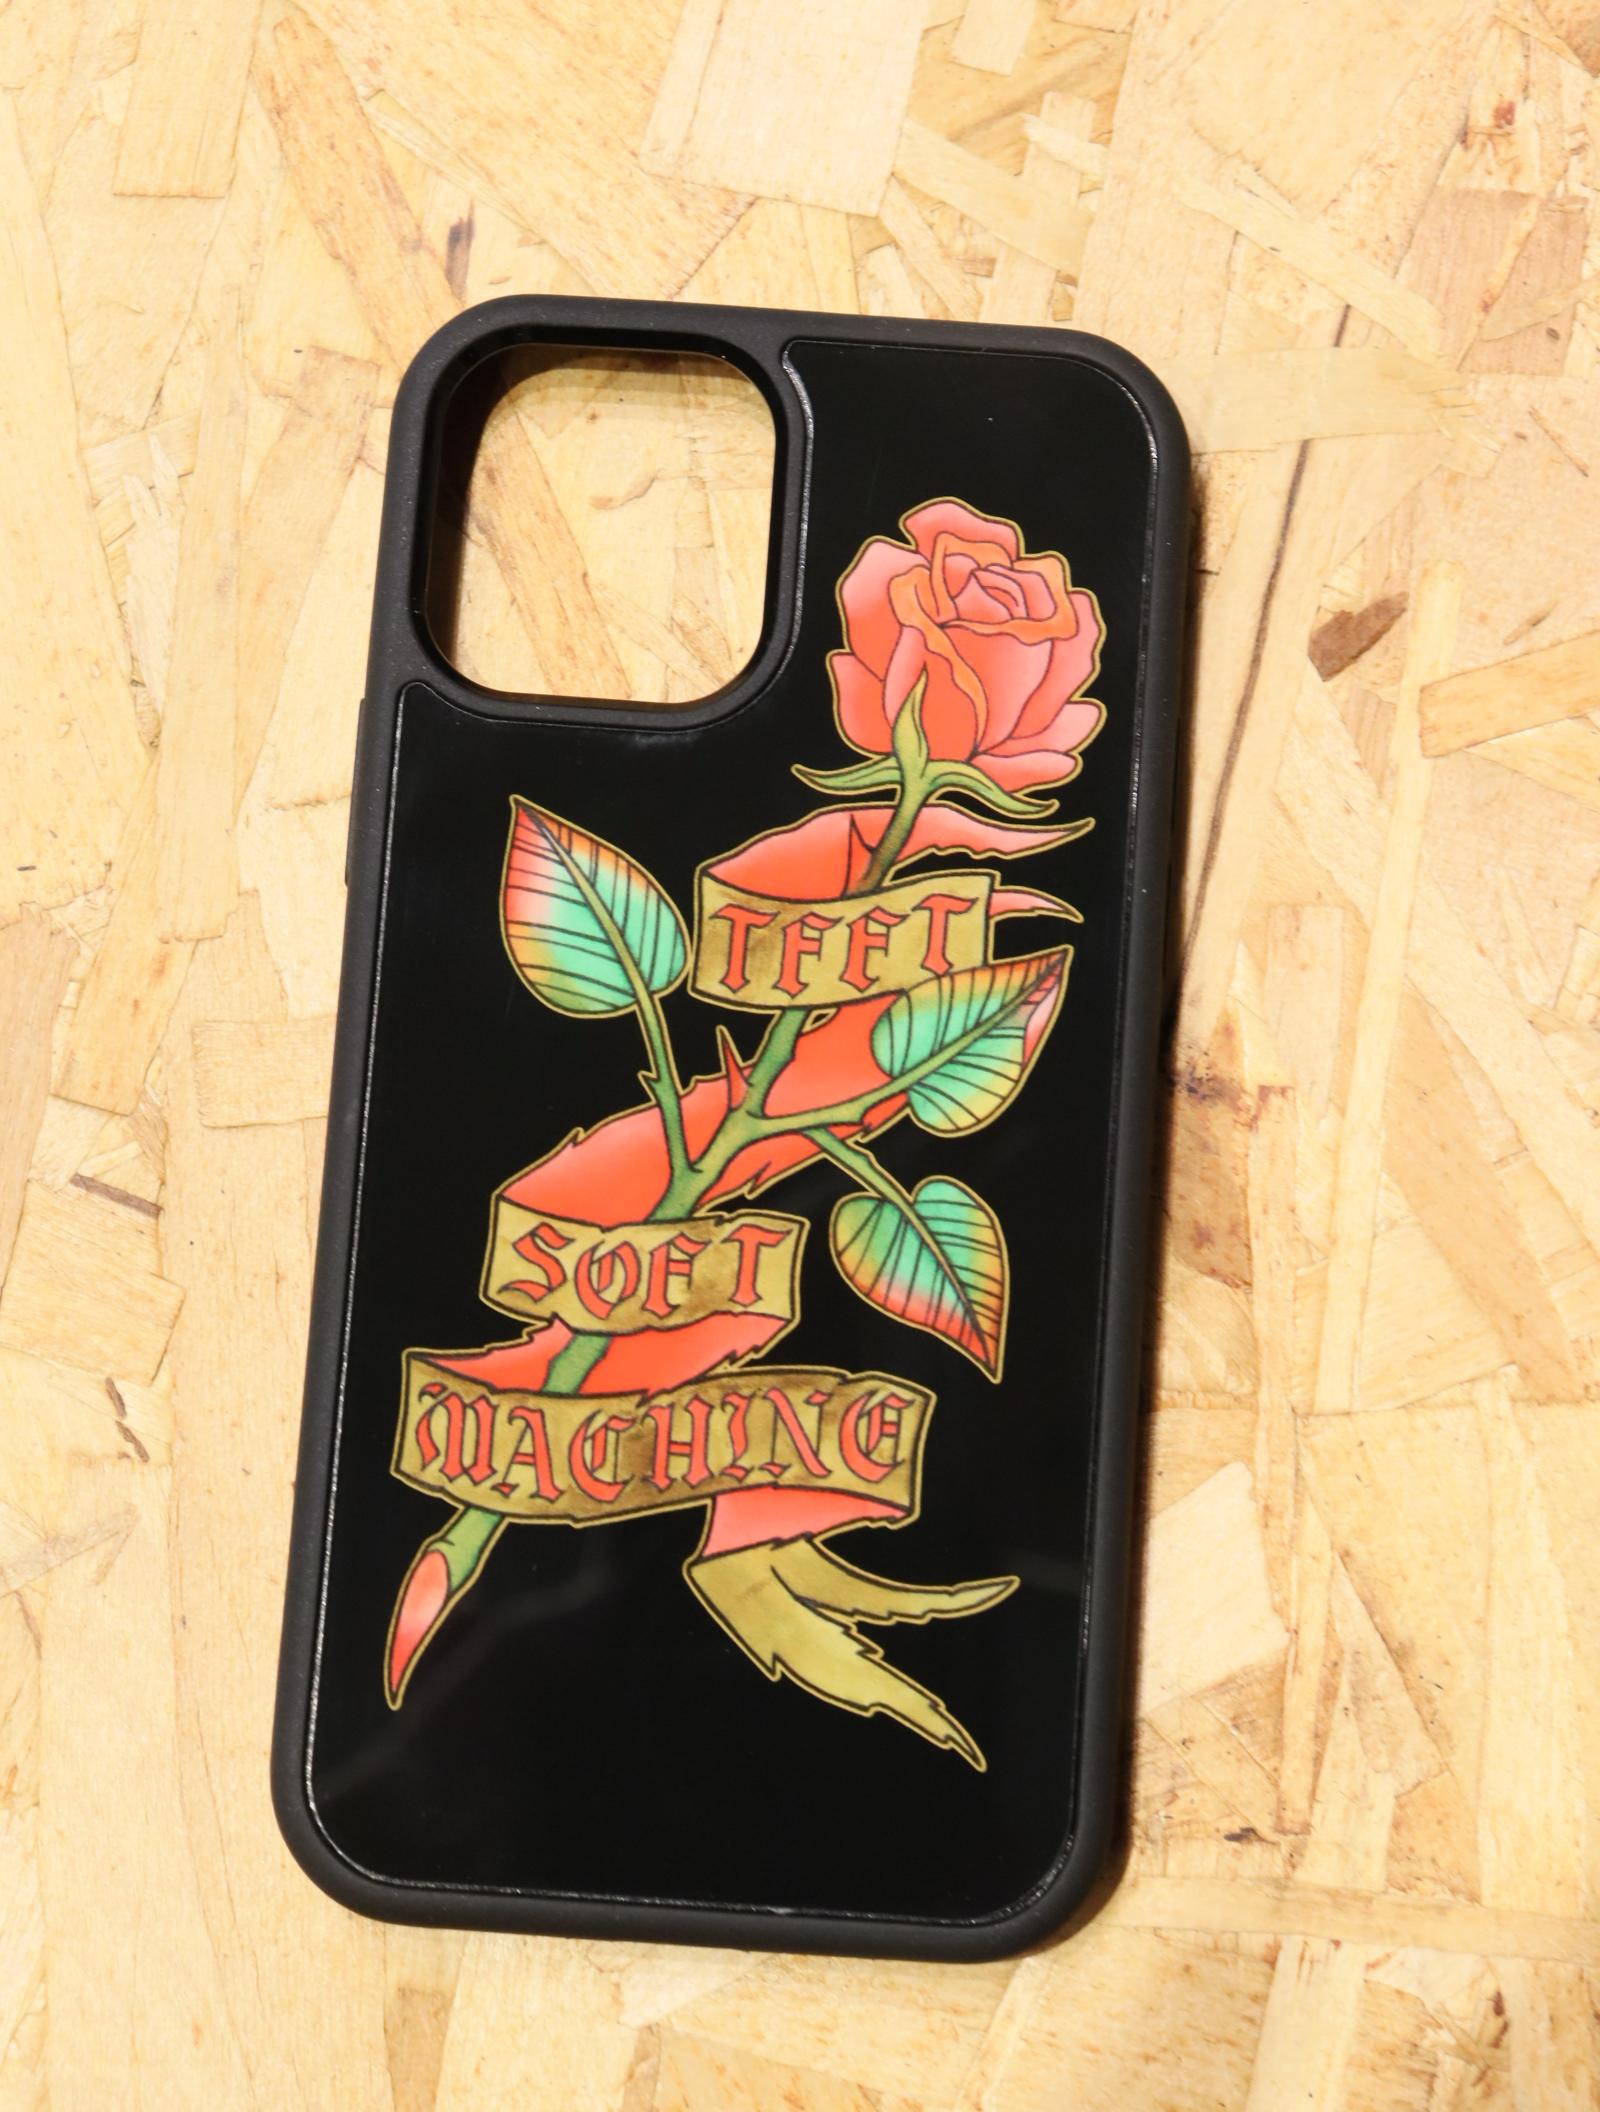 SOFTMACHINE   「ROSE iPhone CASE 」 iPhone 11 、11pro、12/12pro、12mini ケース